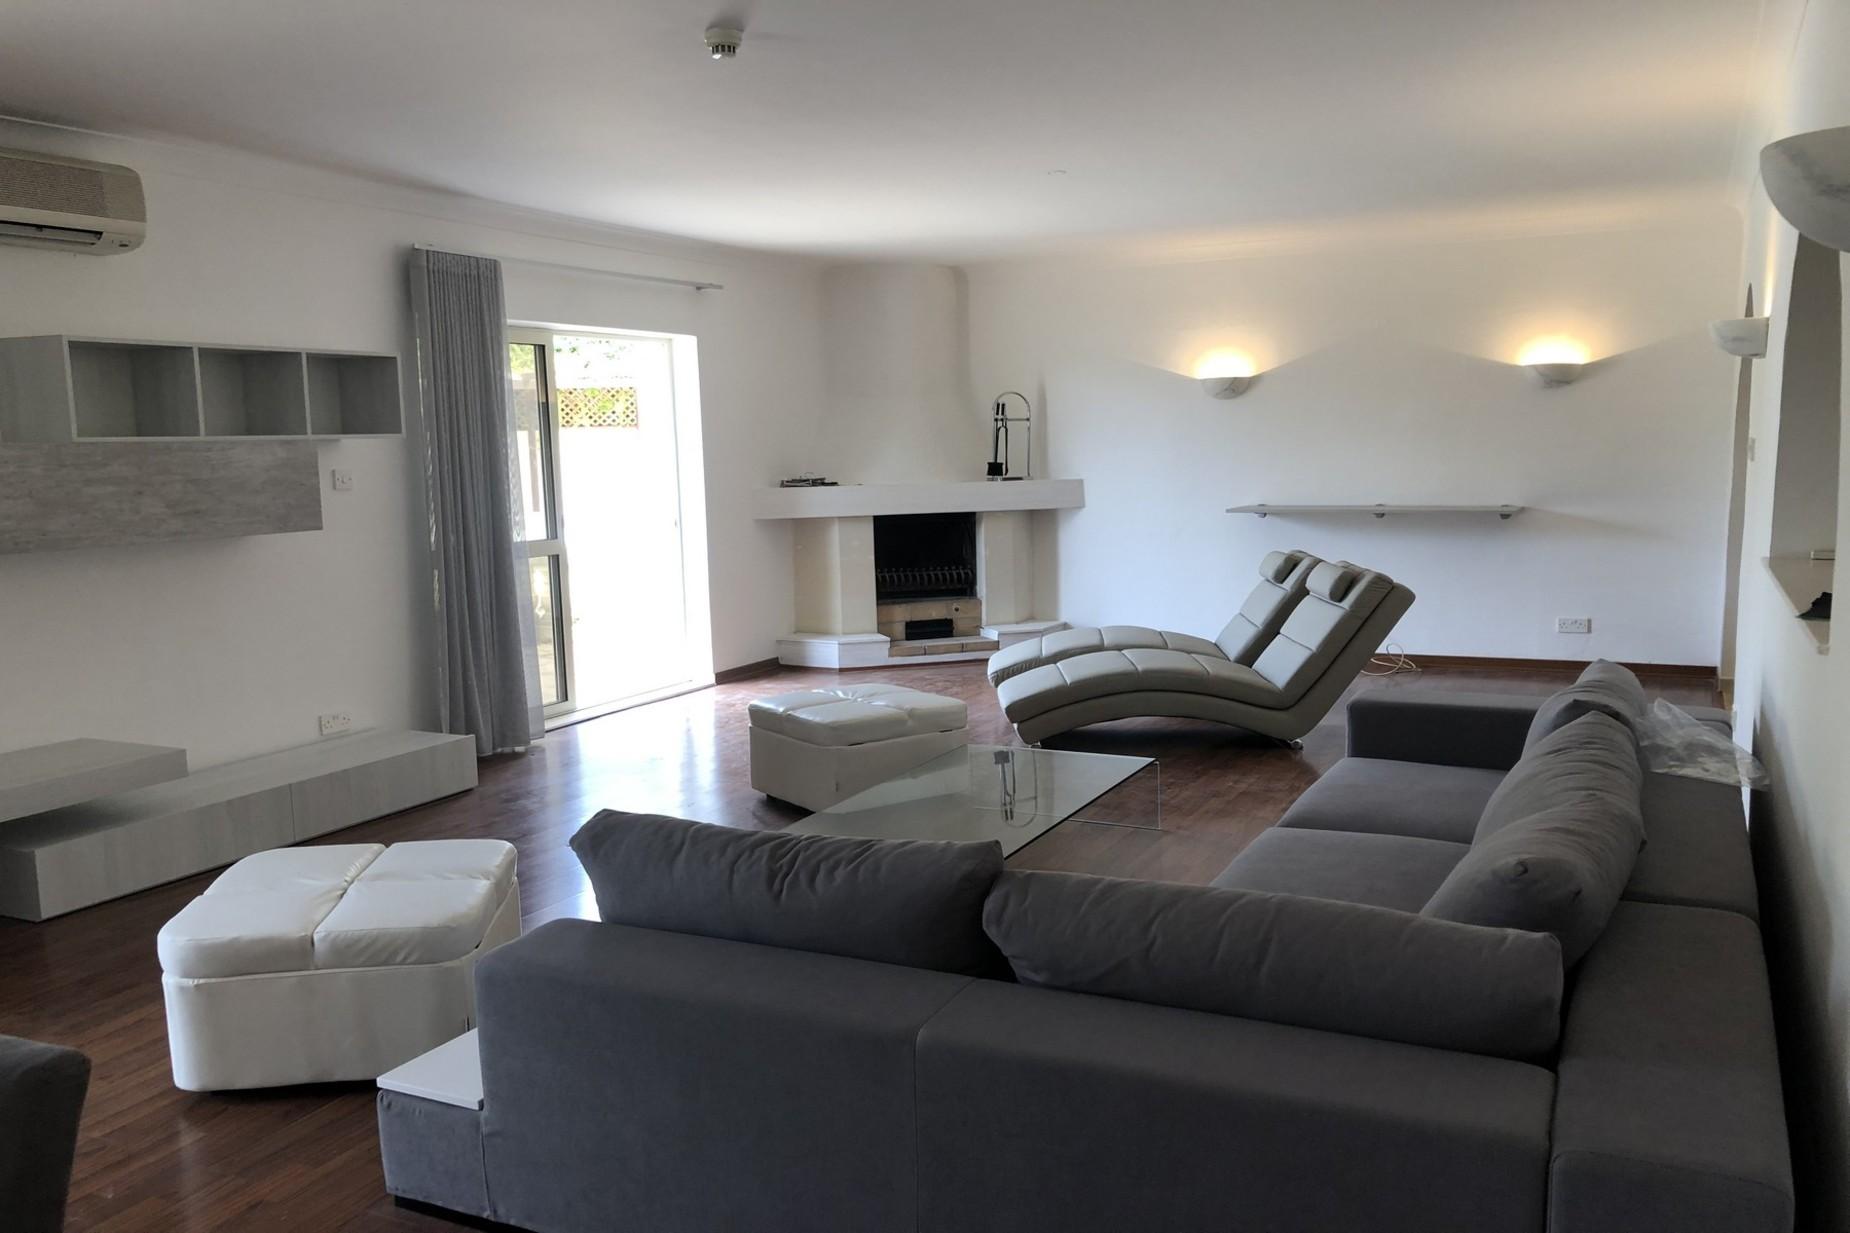 5 bed Villa For Rent in Naxxar, Naxxar - thumb 5